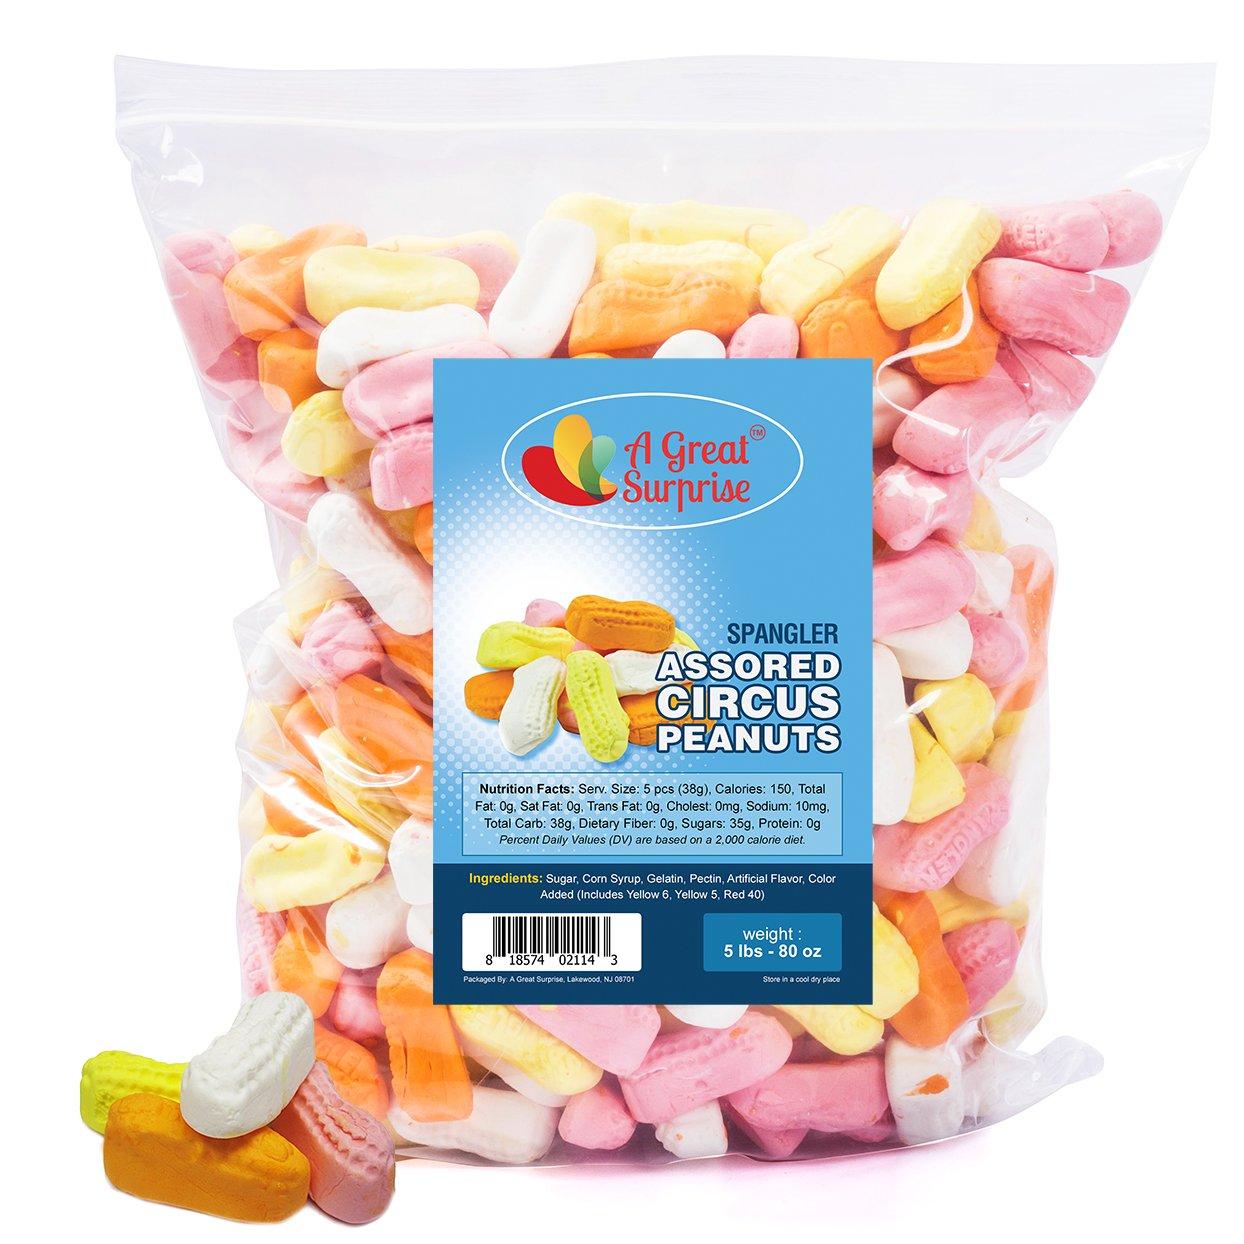 Marshmallow Circus Peanuts - Spangler Circus Peanuts Candy, Circus Peanuts Assorted Flavors, 5 LB Bulk Candy